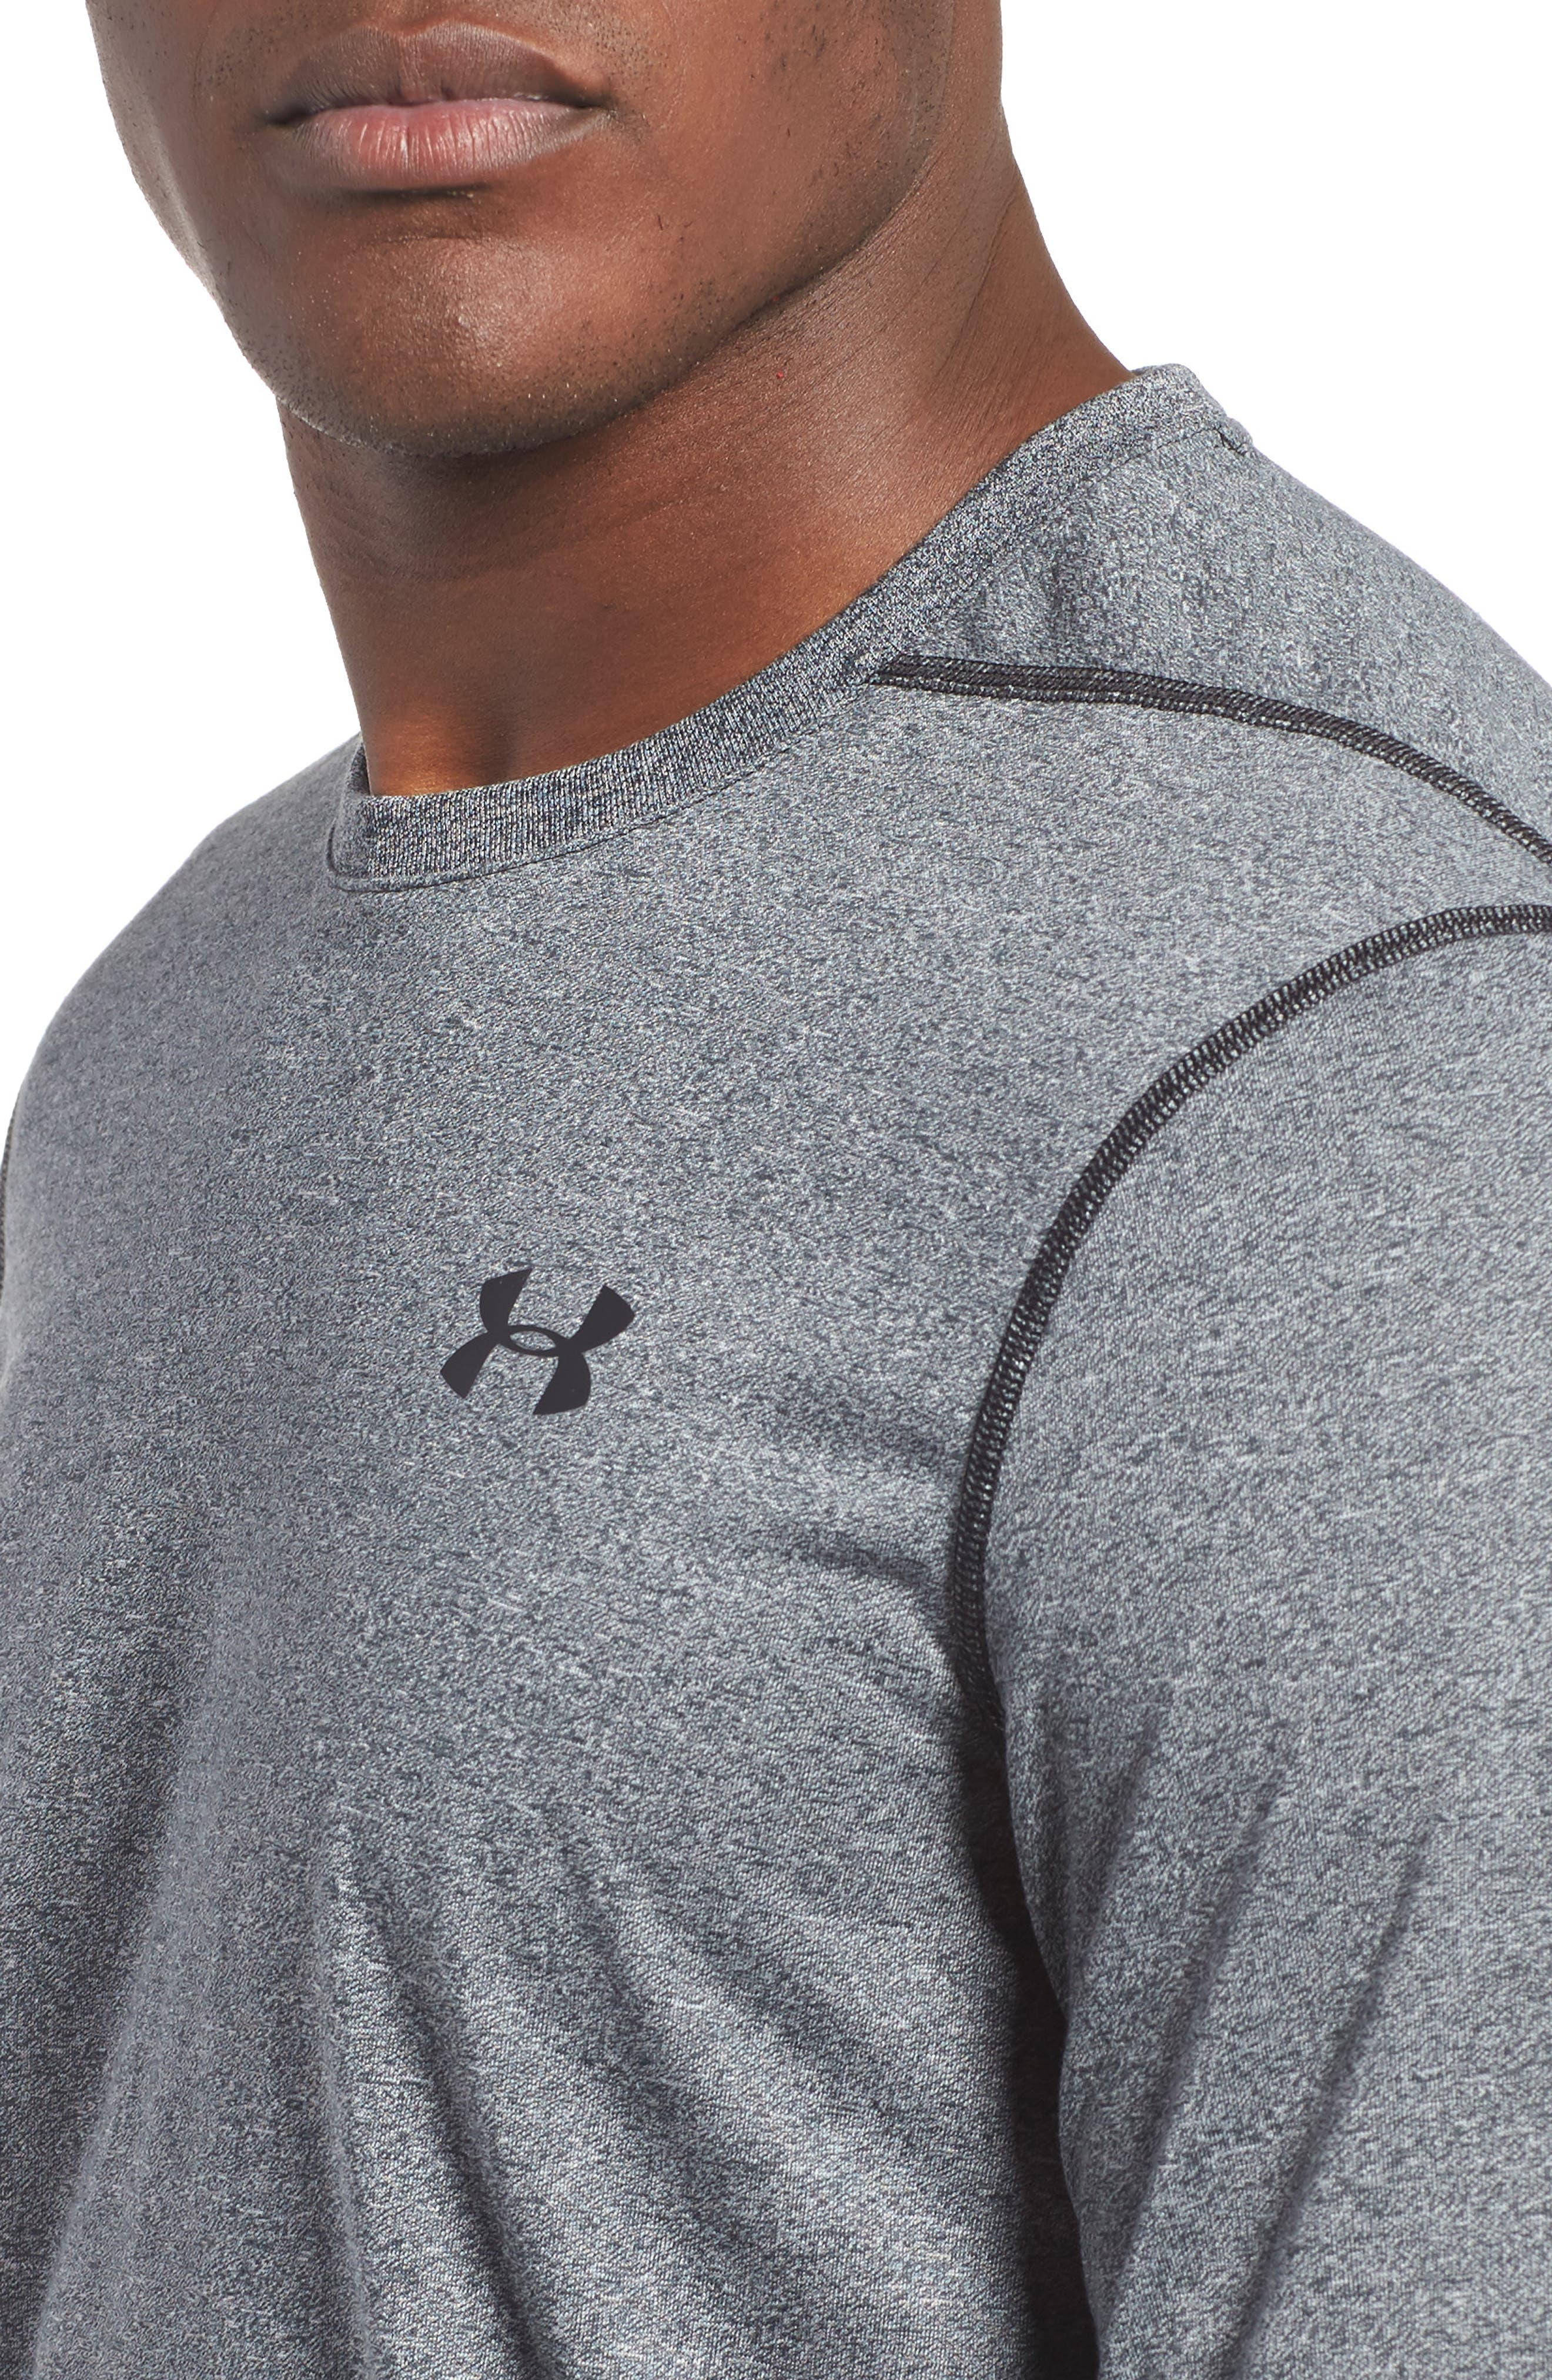 Regular Fit Threadborne T-Shirt,                             Alternate thumbnail 4, color,                             BLACK TWIST